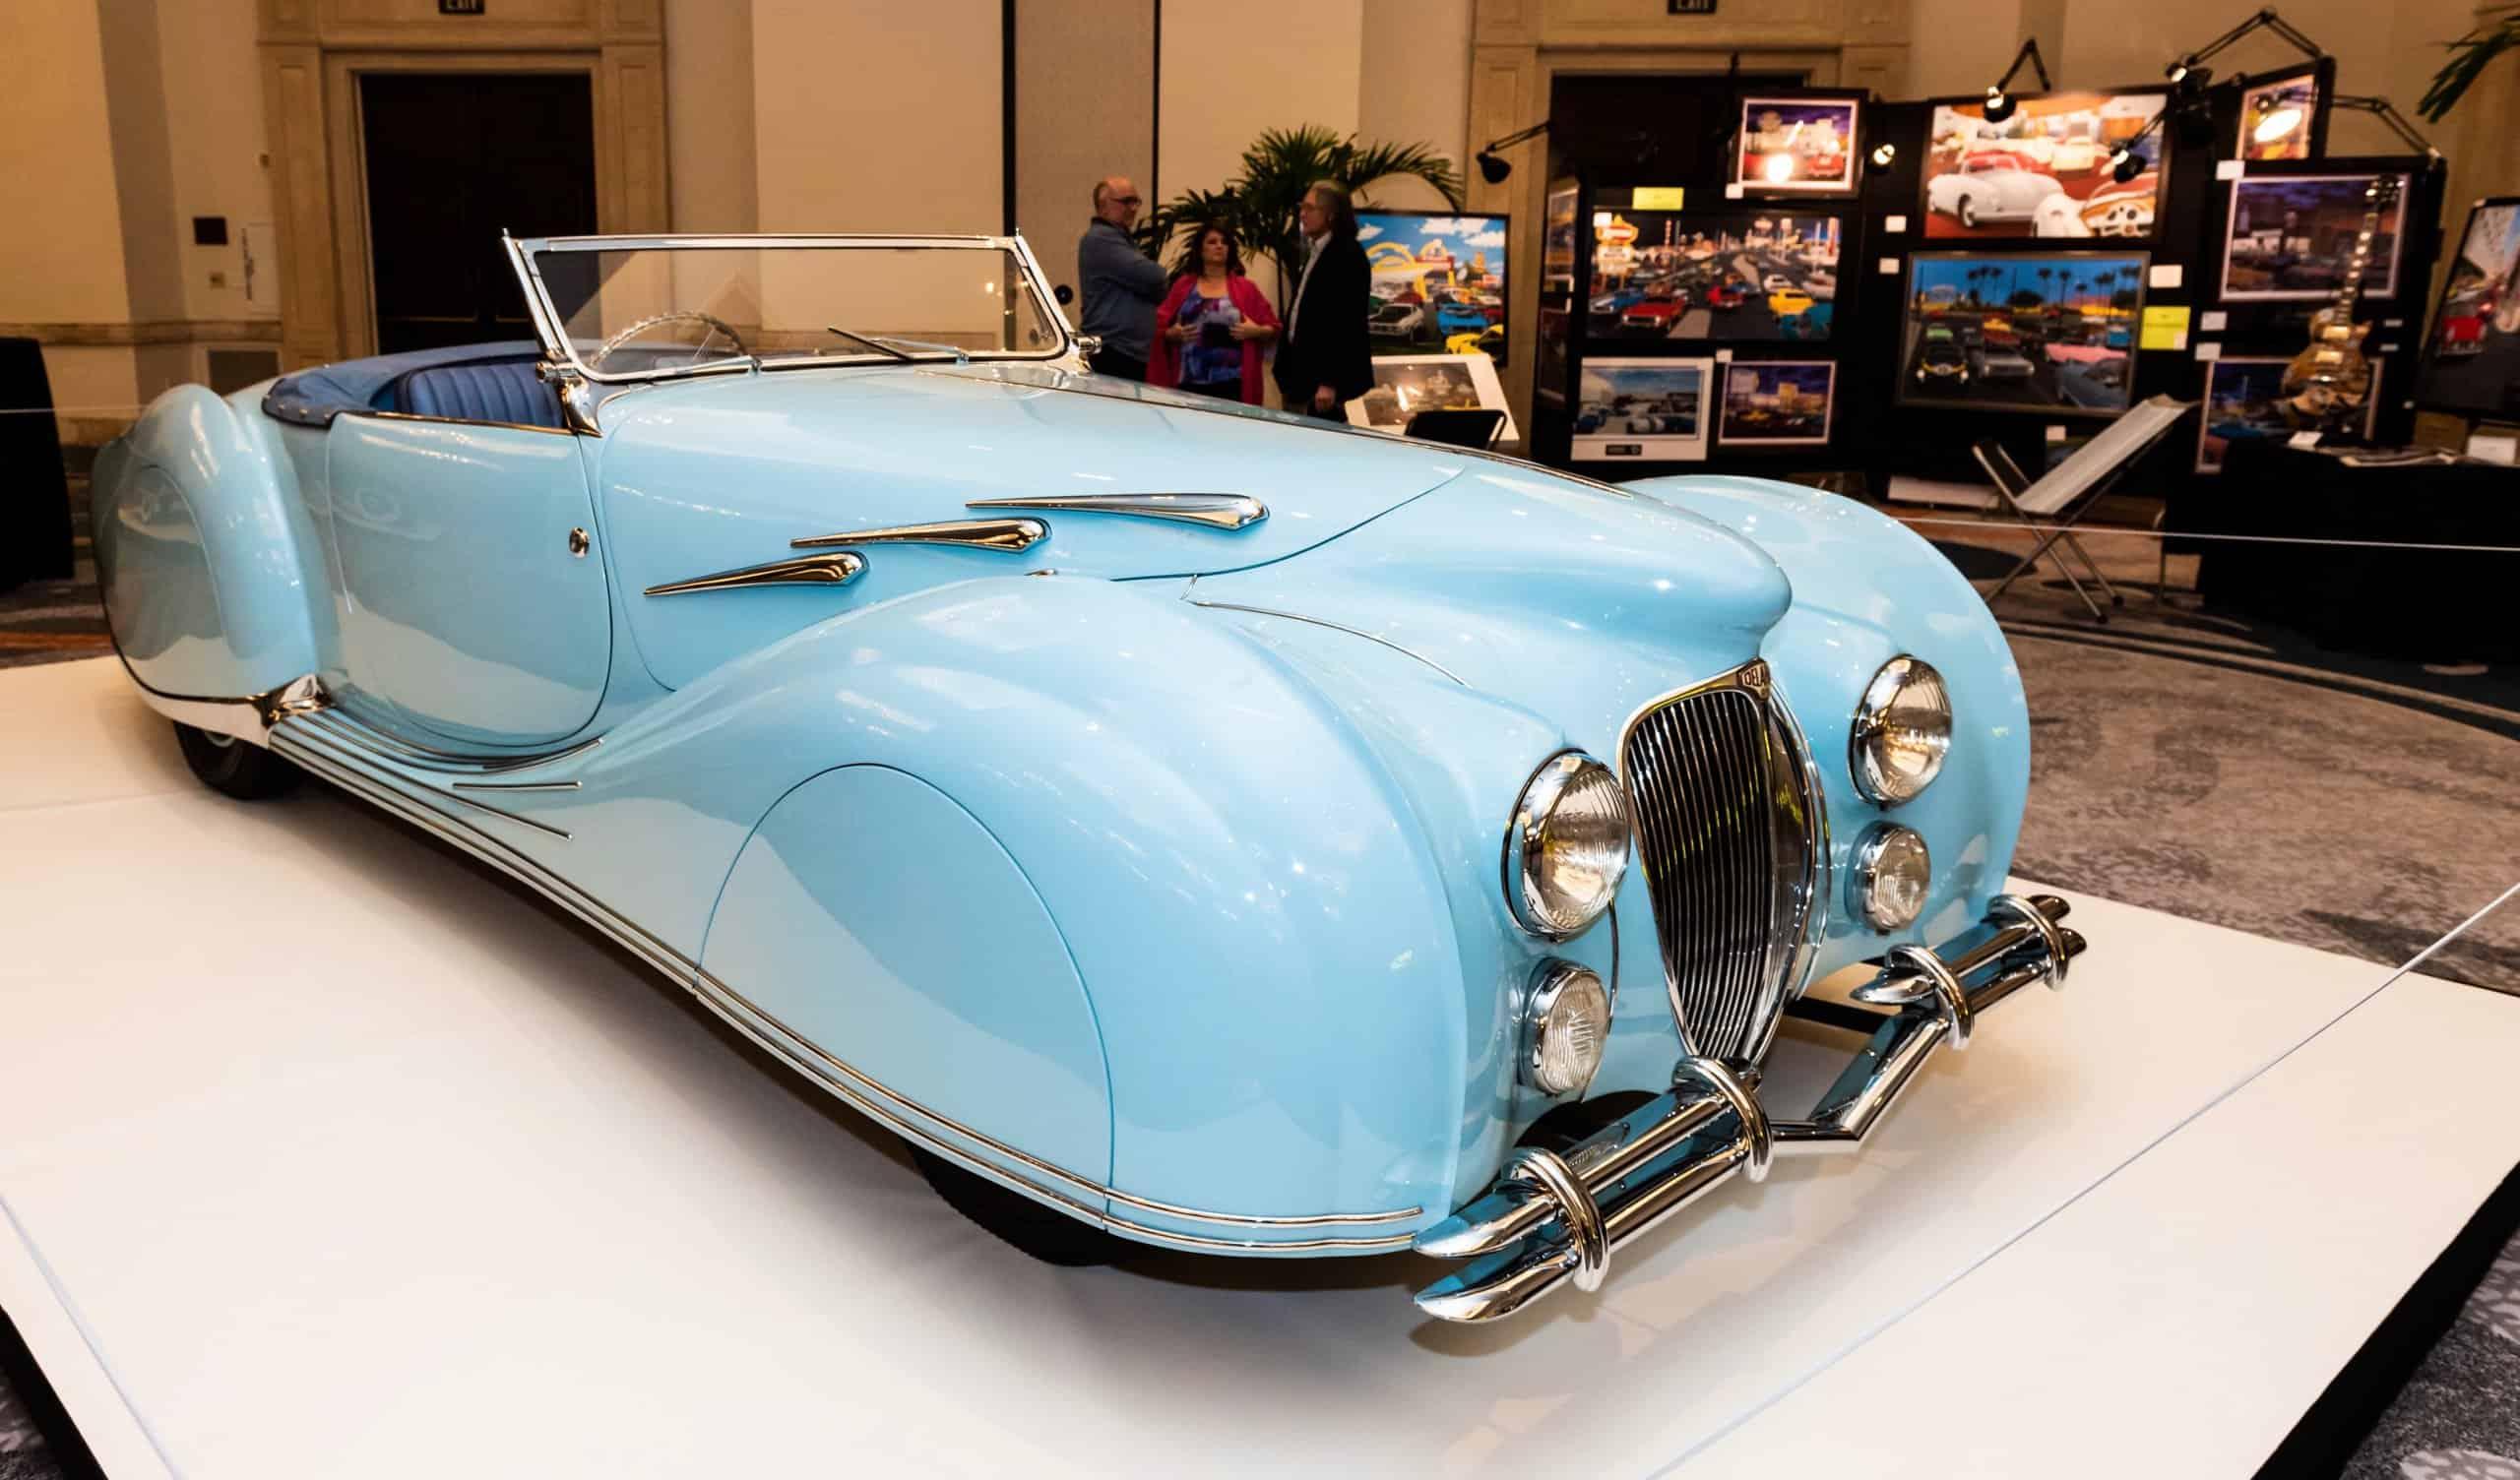 Boca Raton, Ferrari GTO takes Best of Show honors at Boca Raton Concours, ClassicCars.com Journal